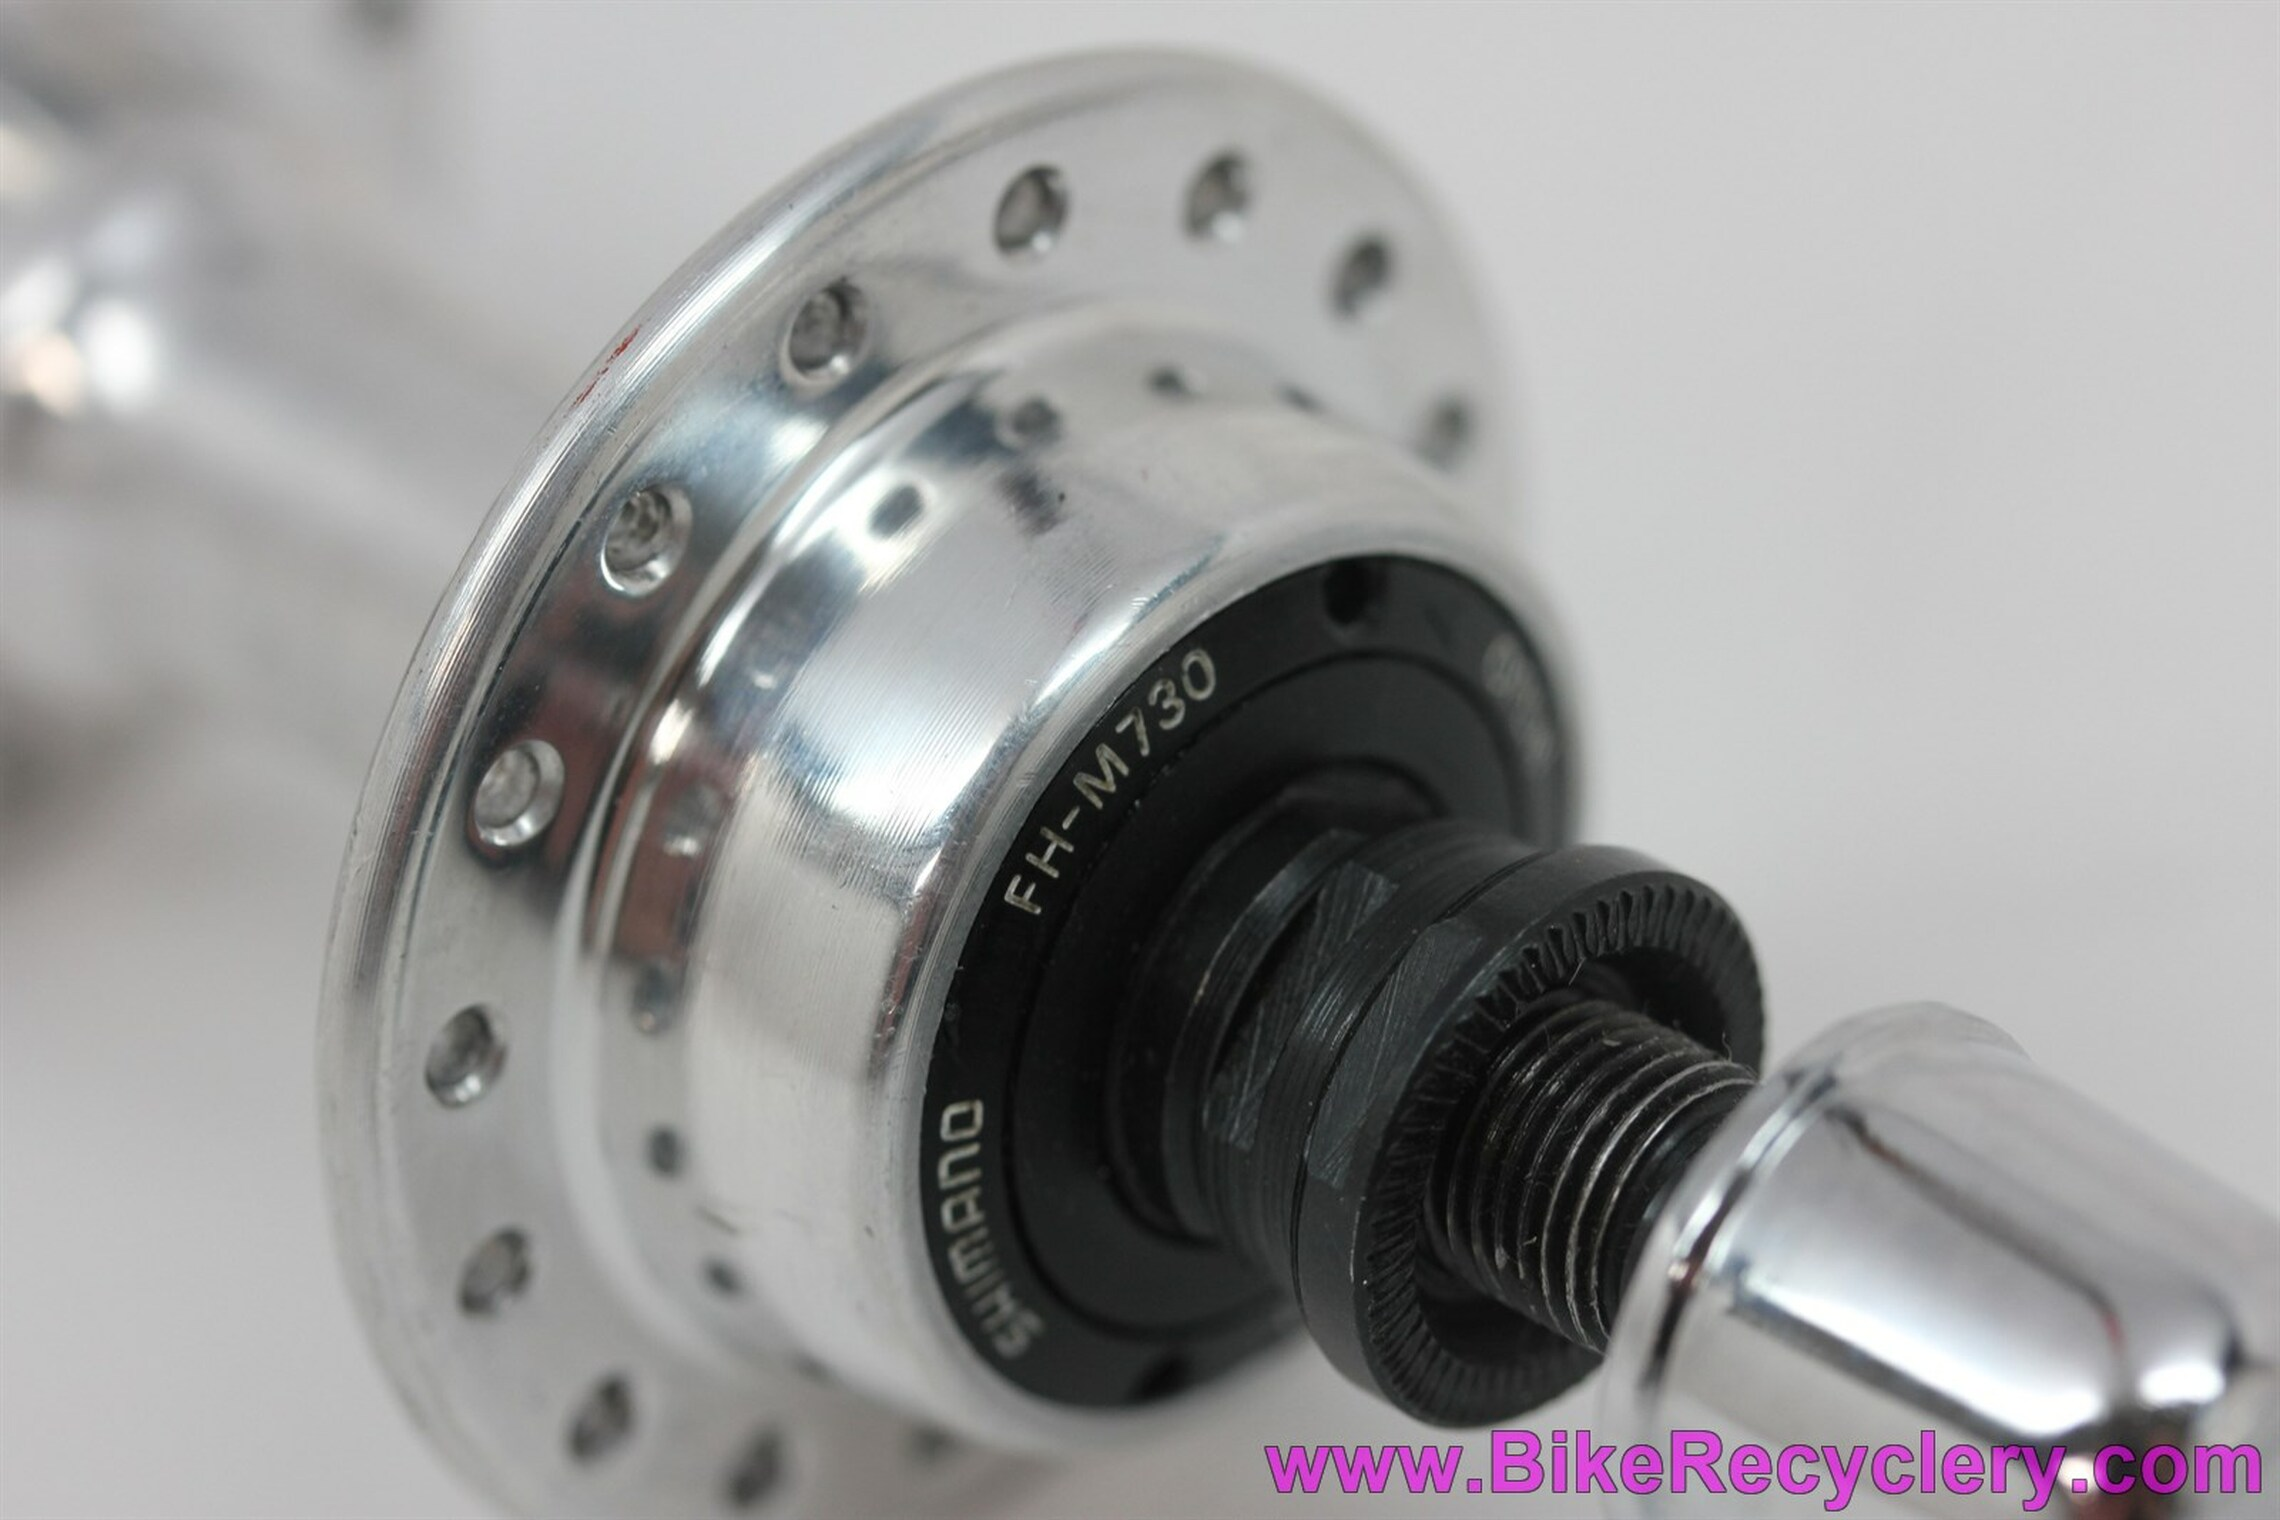 NOS Shimano Deore XT Hubset: HB-M730 FH-M730 6/7 Speed - 36H/32H x 126mm- QR Skewers